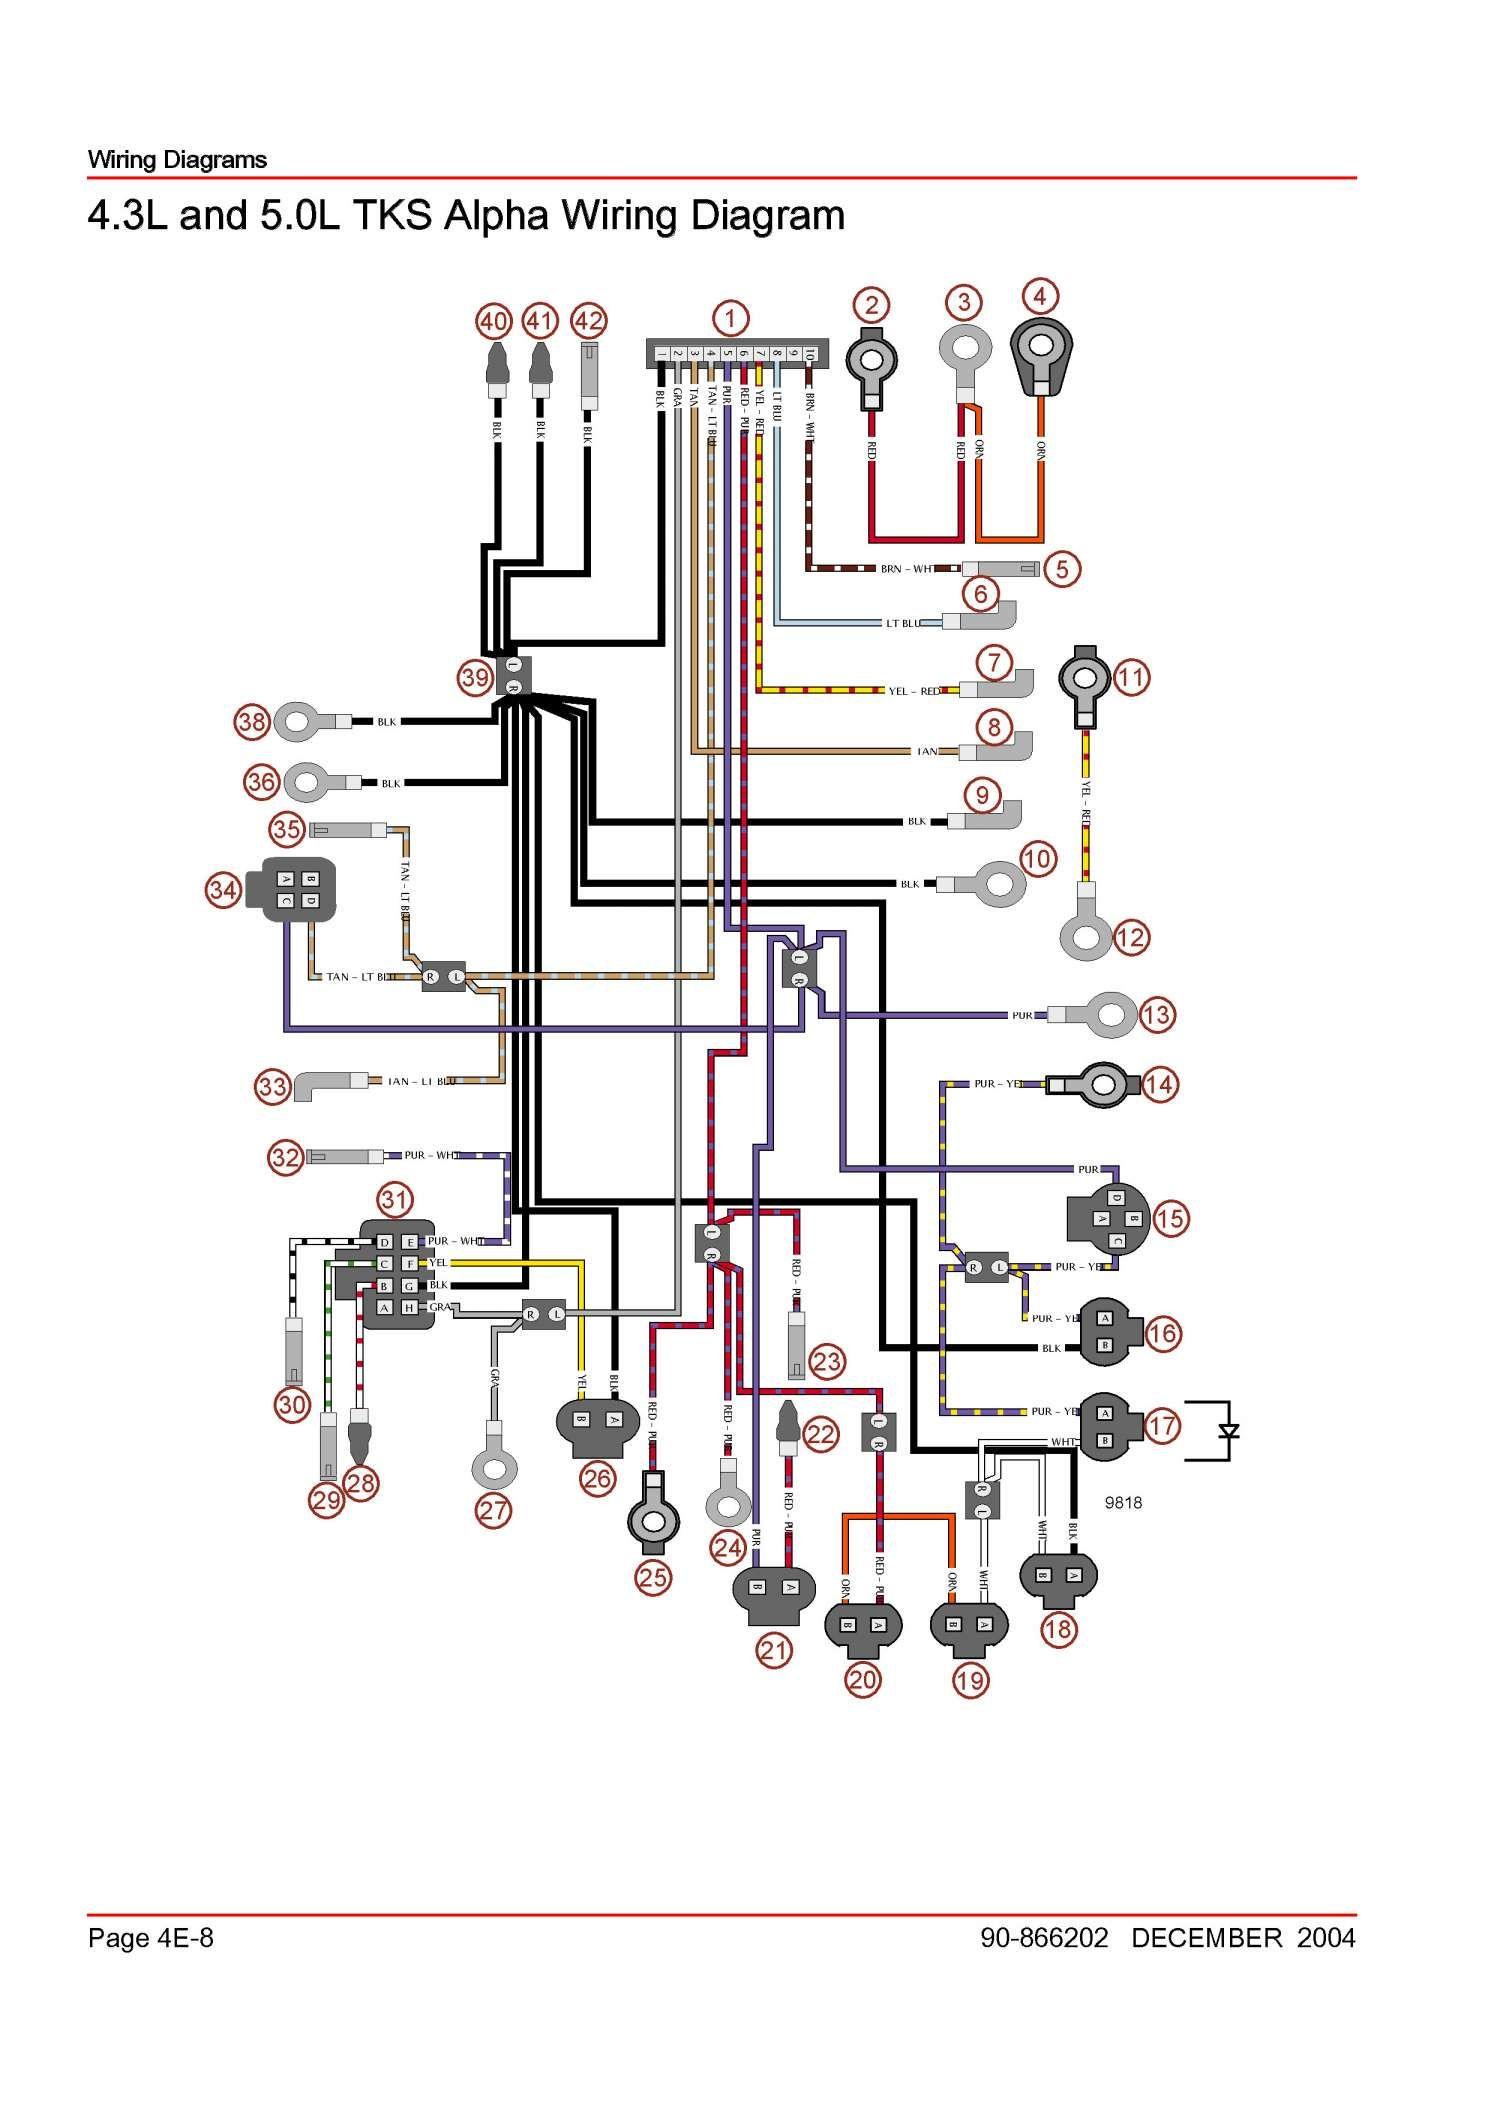 Mercruiser 140 Engine Wiring Diagram And Mefi Wiring Diagram List Of Wiring Diagrams Diagram